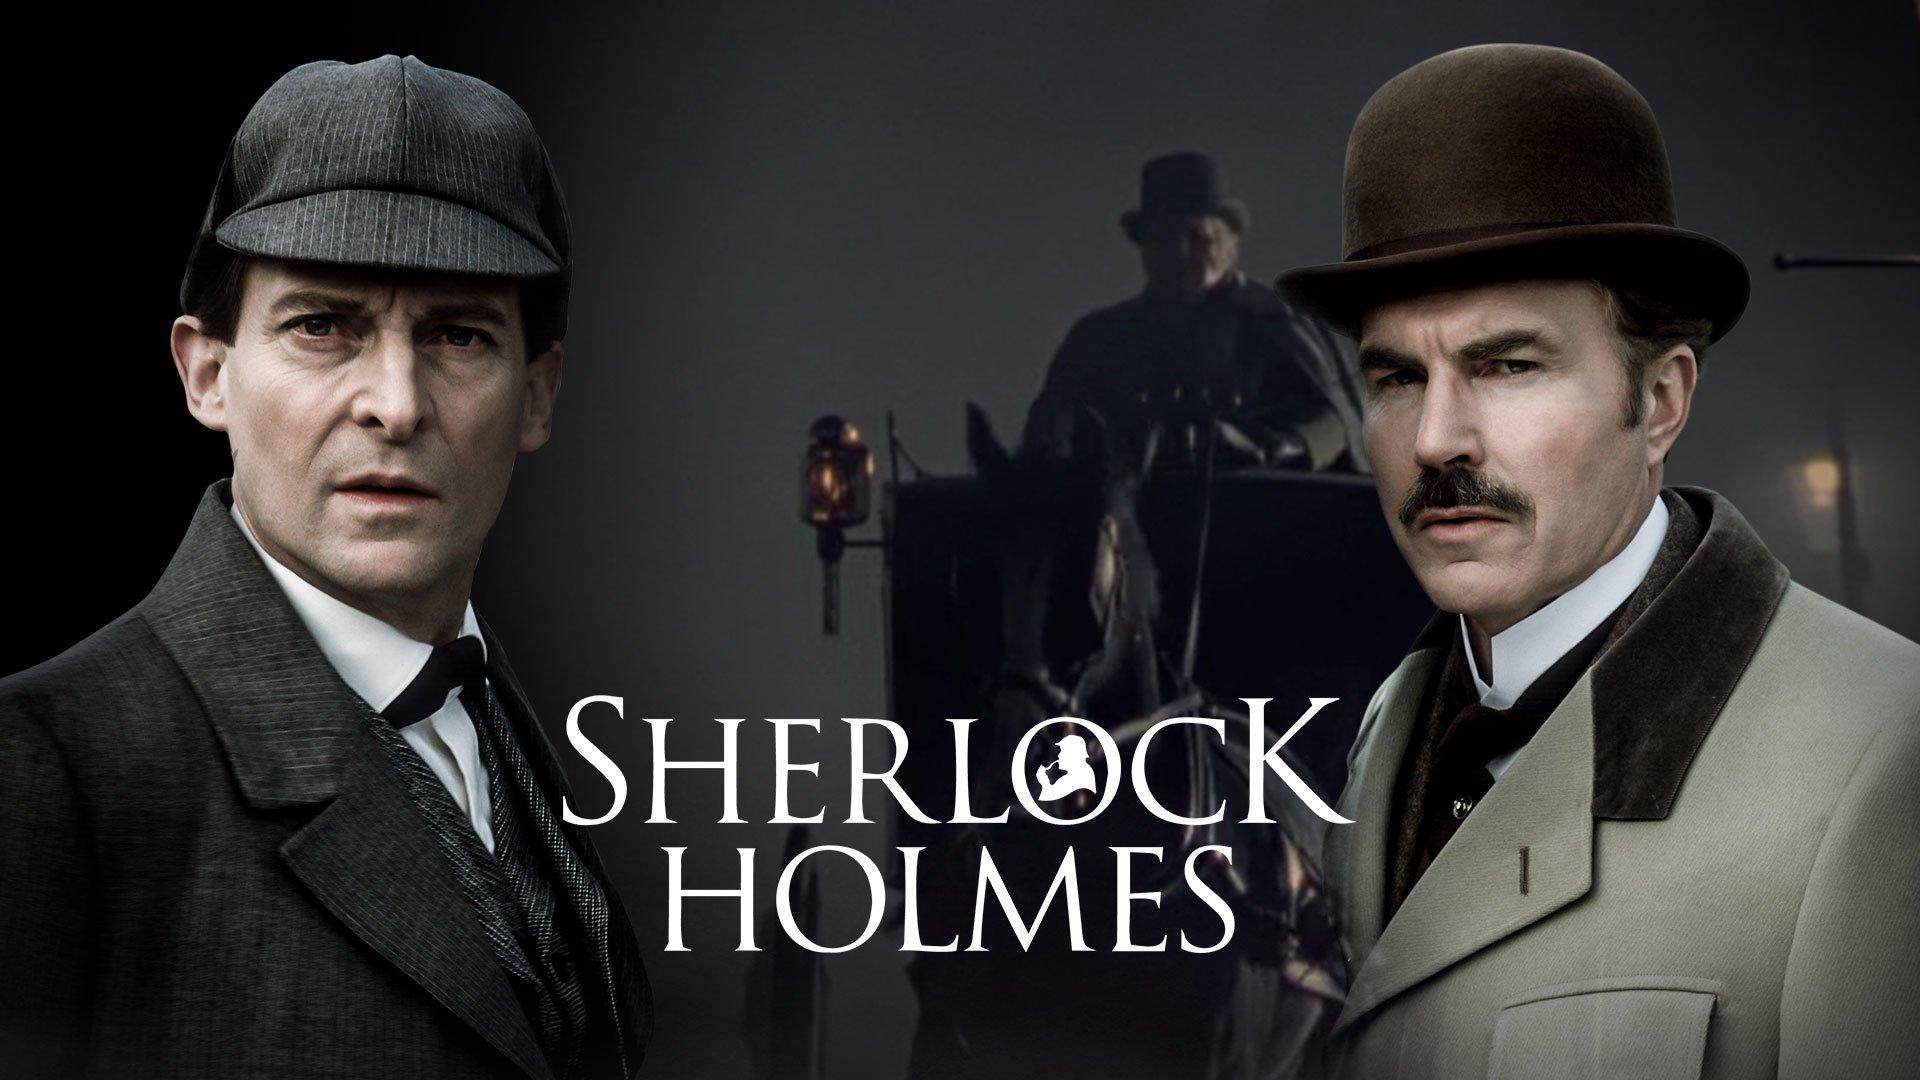 Sherlock Holmes on BritBox UK